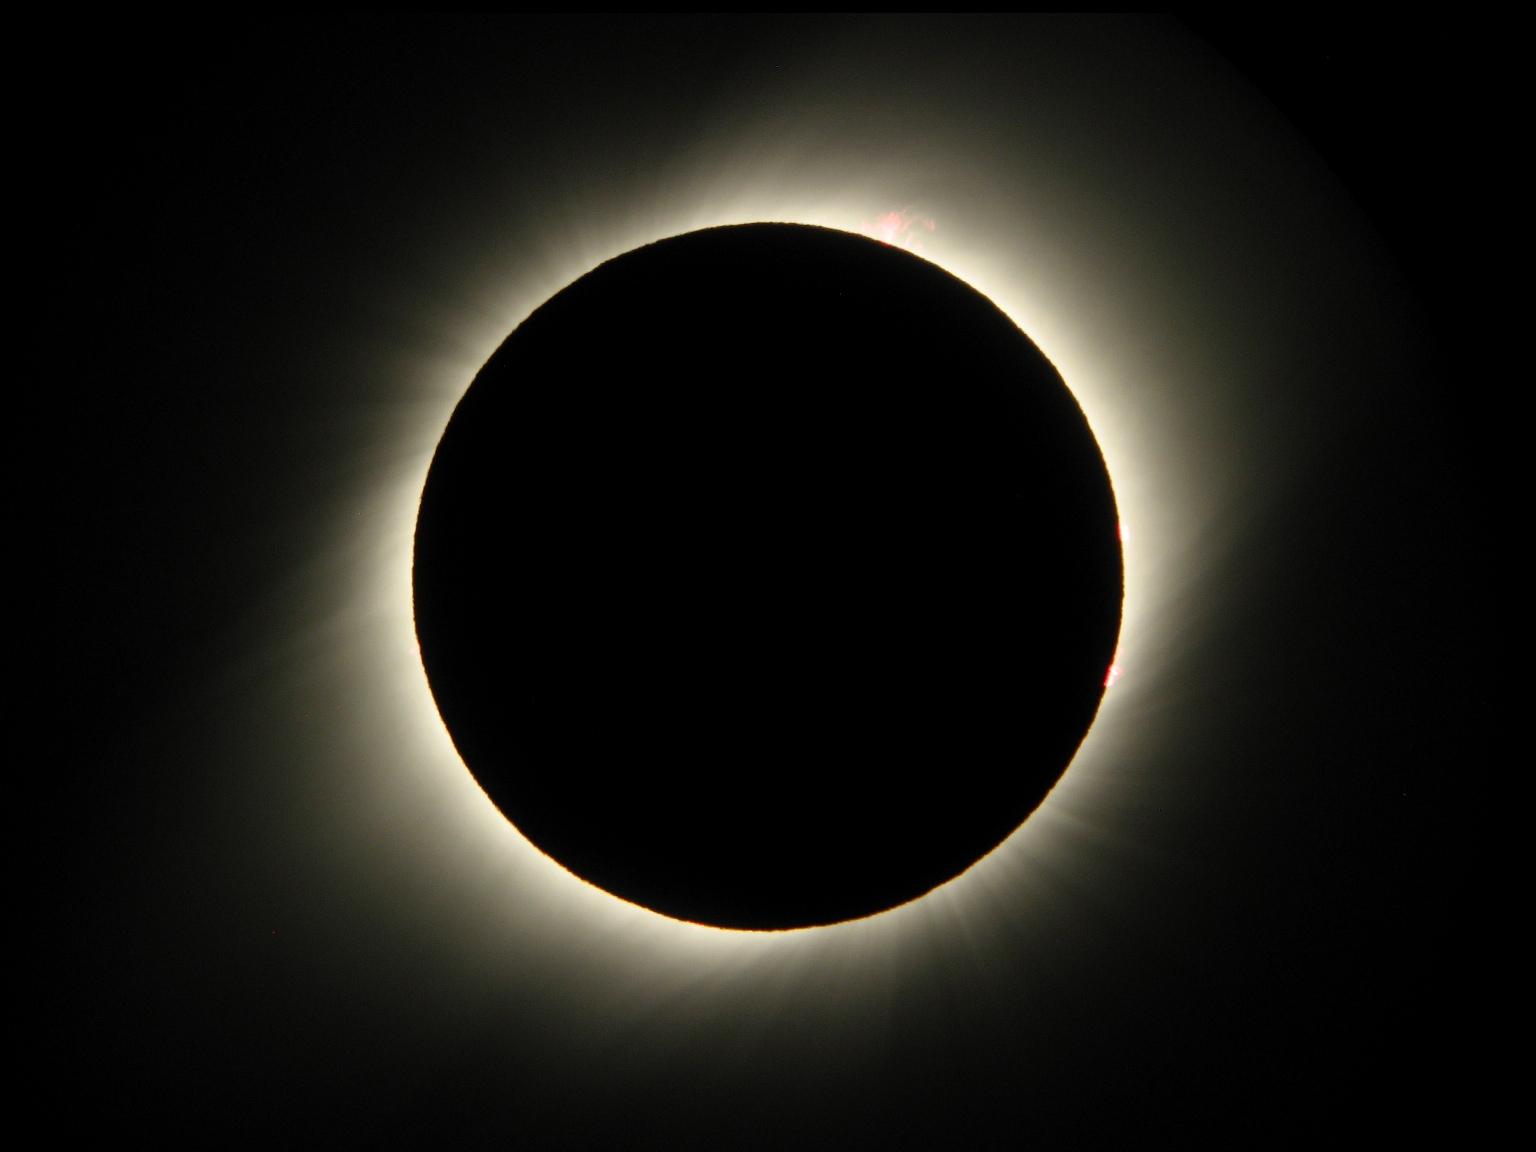 eclipse-020719-278mmf3b-8085.jpg.494745d68ead2d9a8e31b7f69867c8e2.jpg